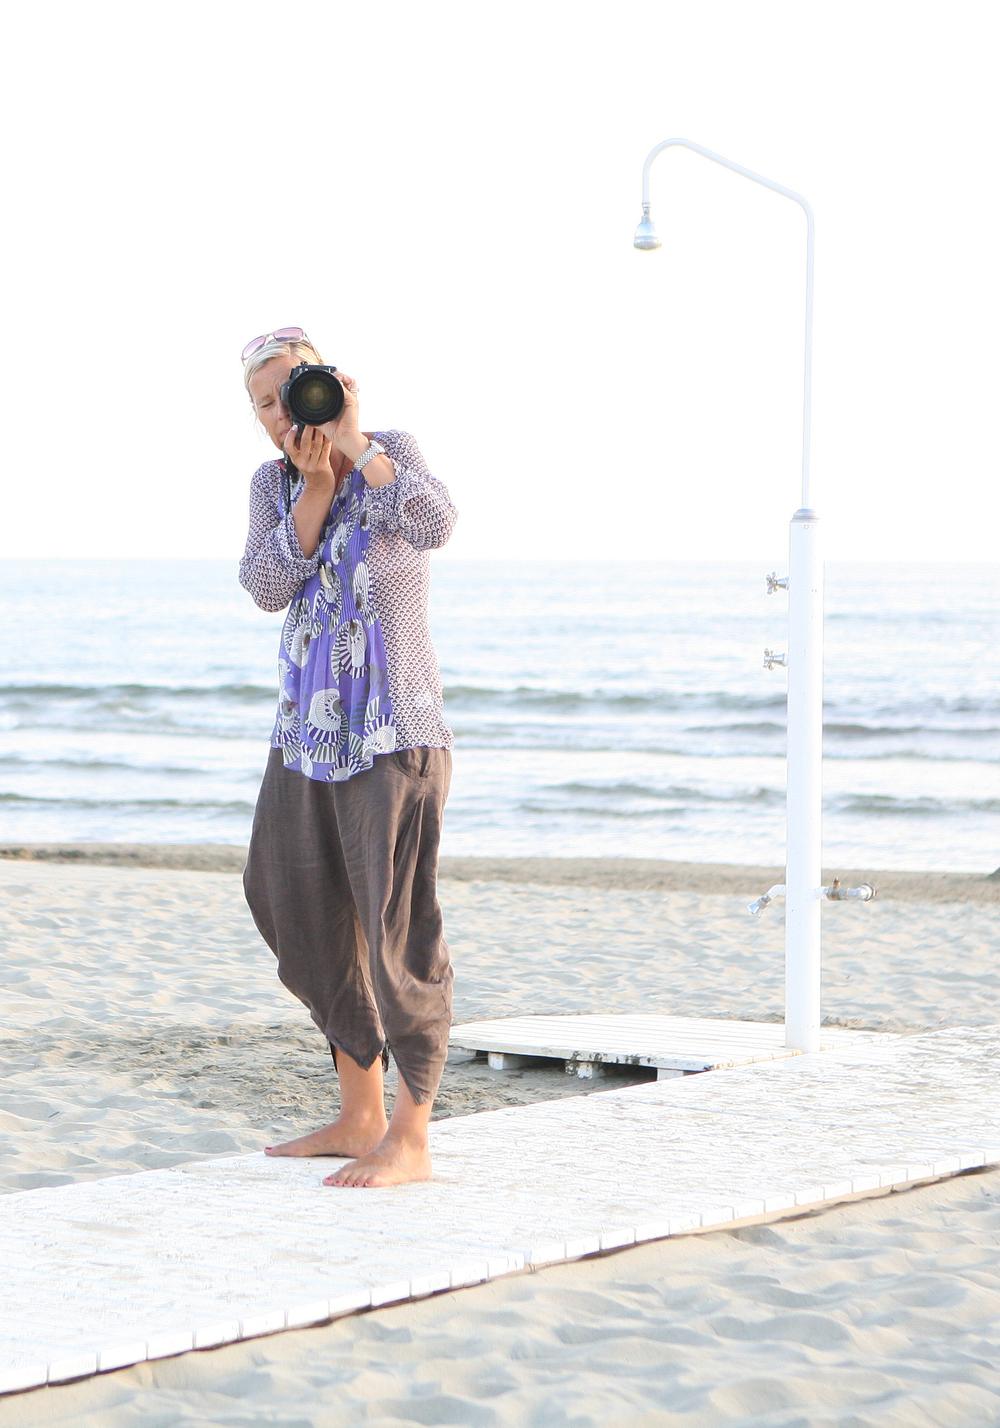 Susan_Mariani_Photography .jpg